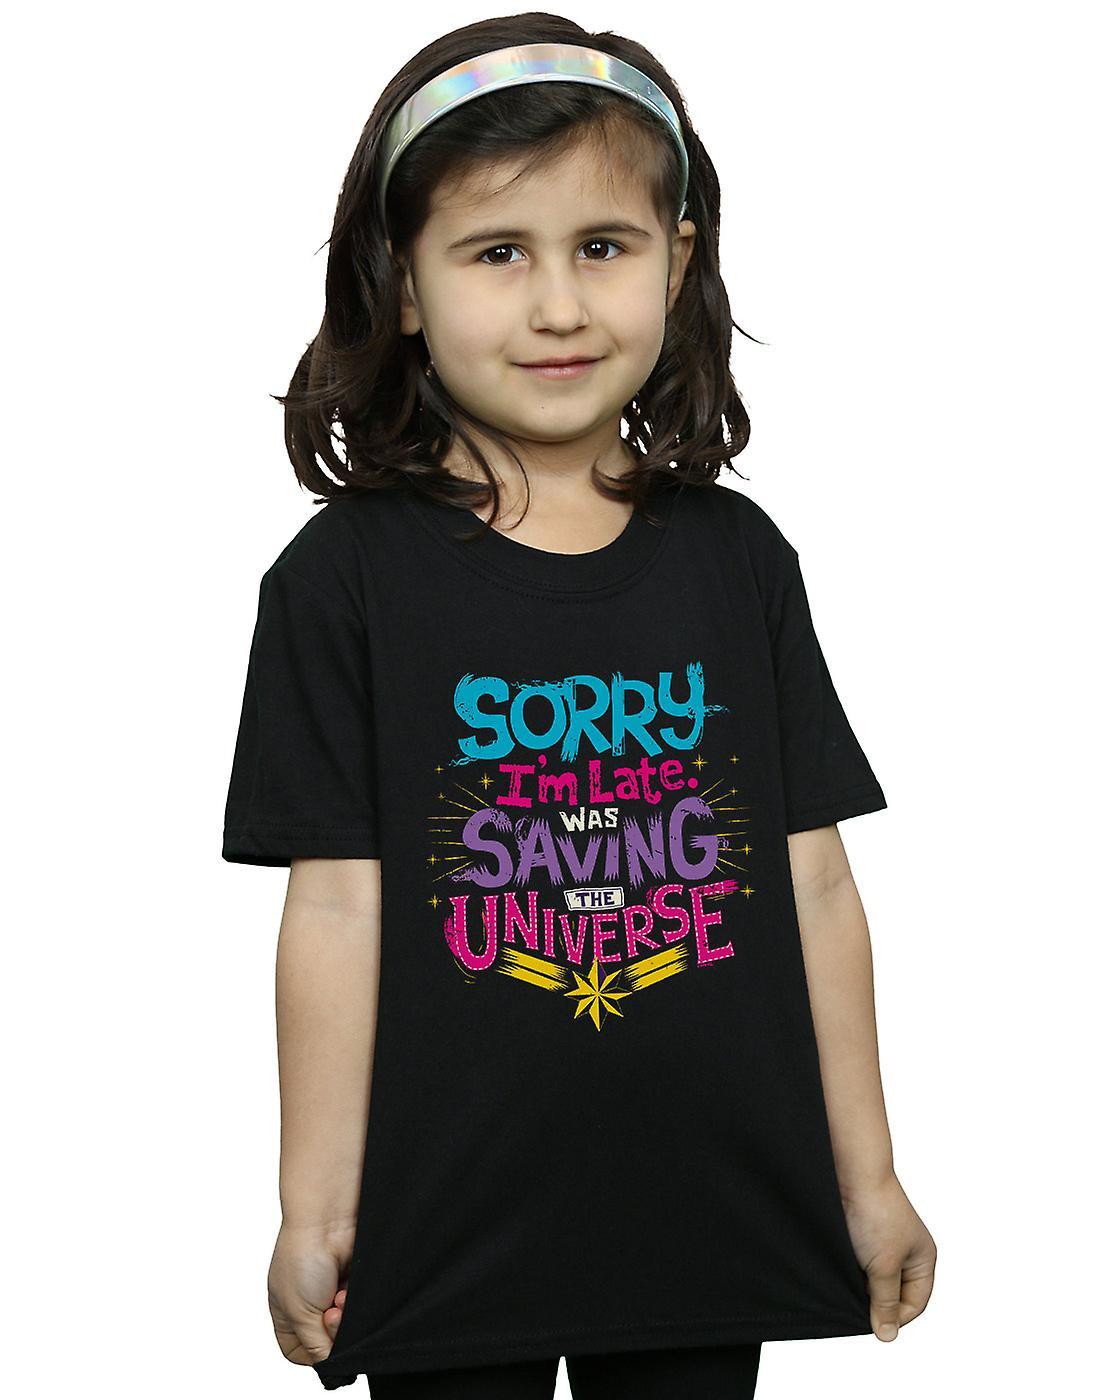 Marvel Girls Captain Marvel Saving The Universe T-Shirt